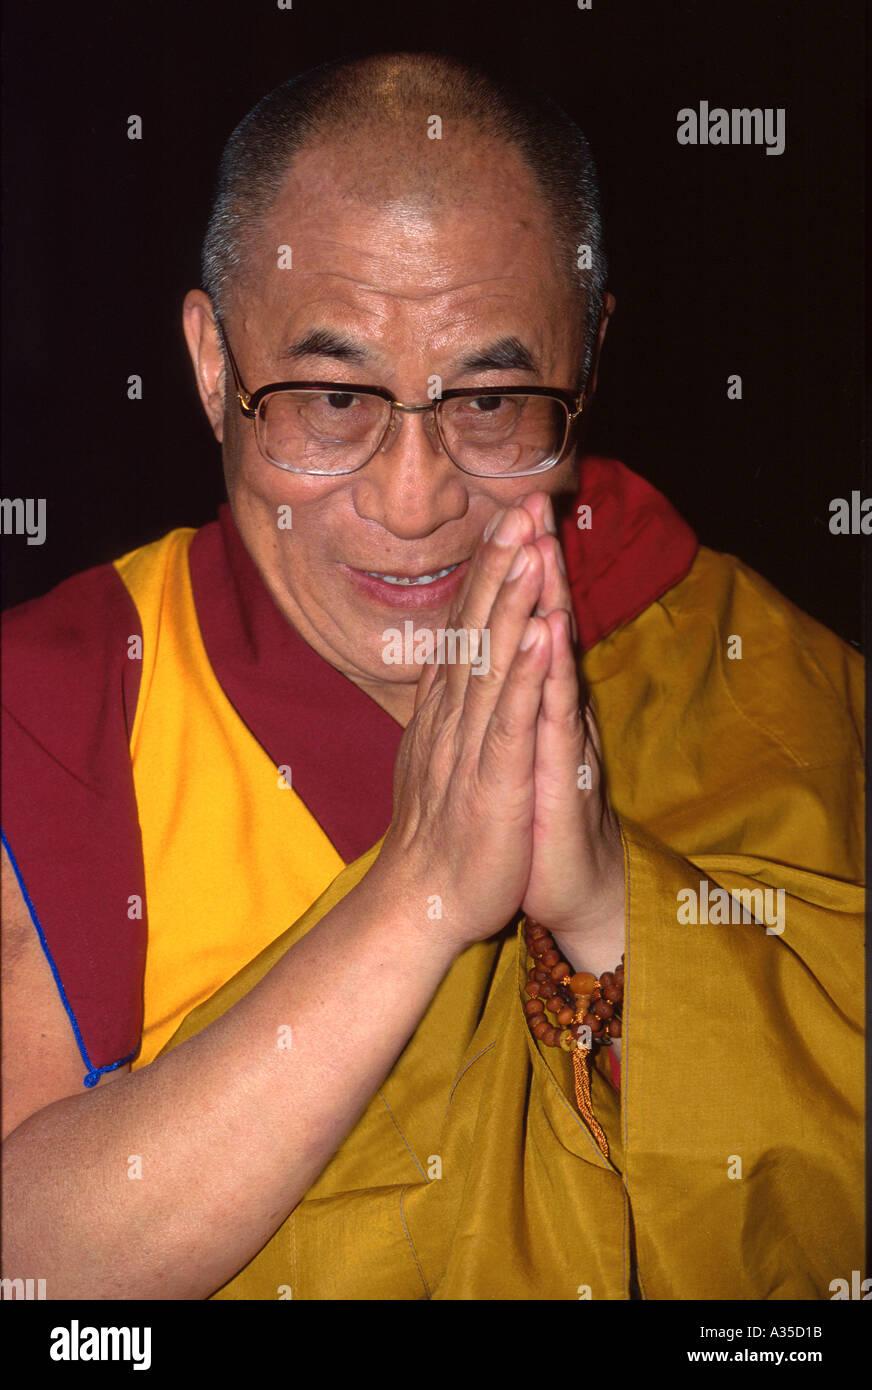 His Holiness the Dalai Lama - Stock Image